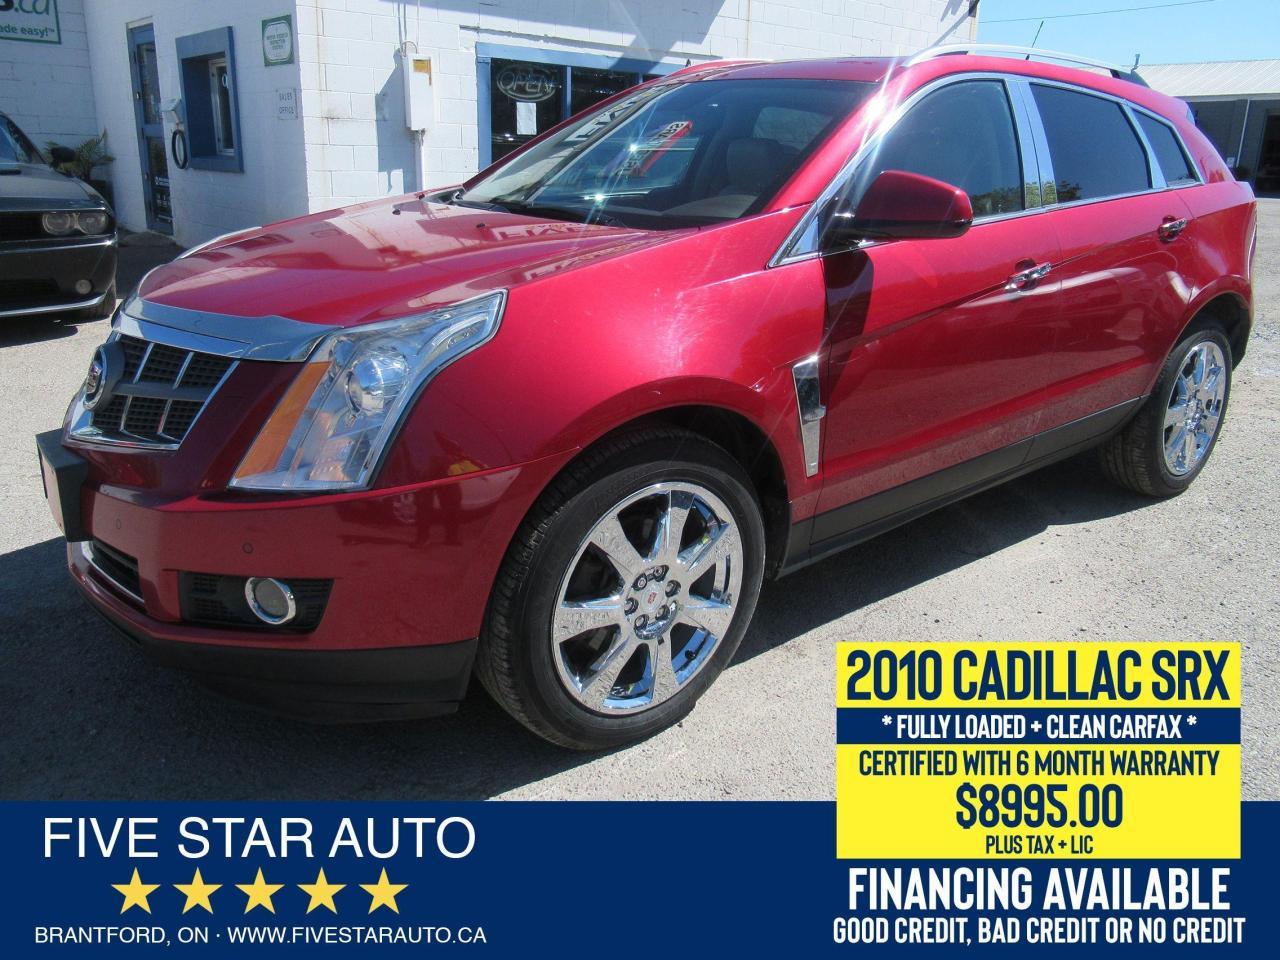 2010 Cadillac SRX PERFORMANCE *Clean Carfax* - Certified + Warranty